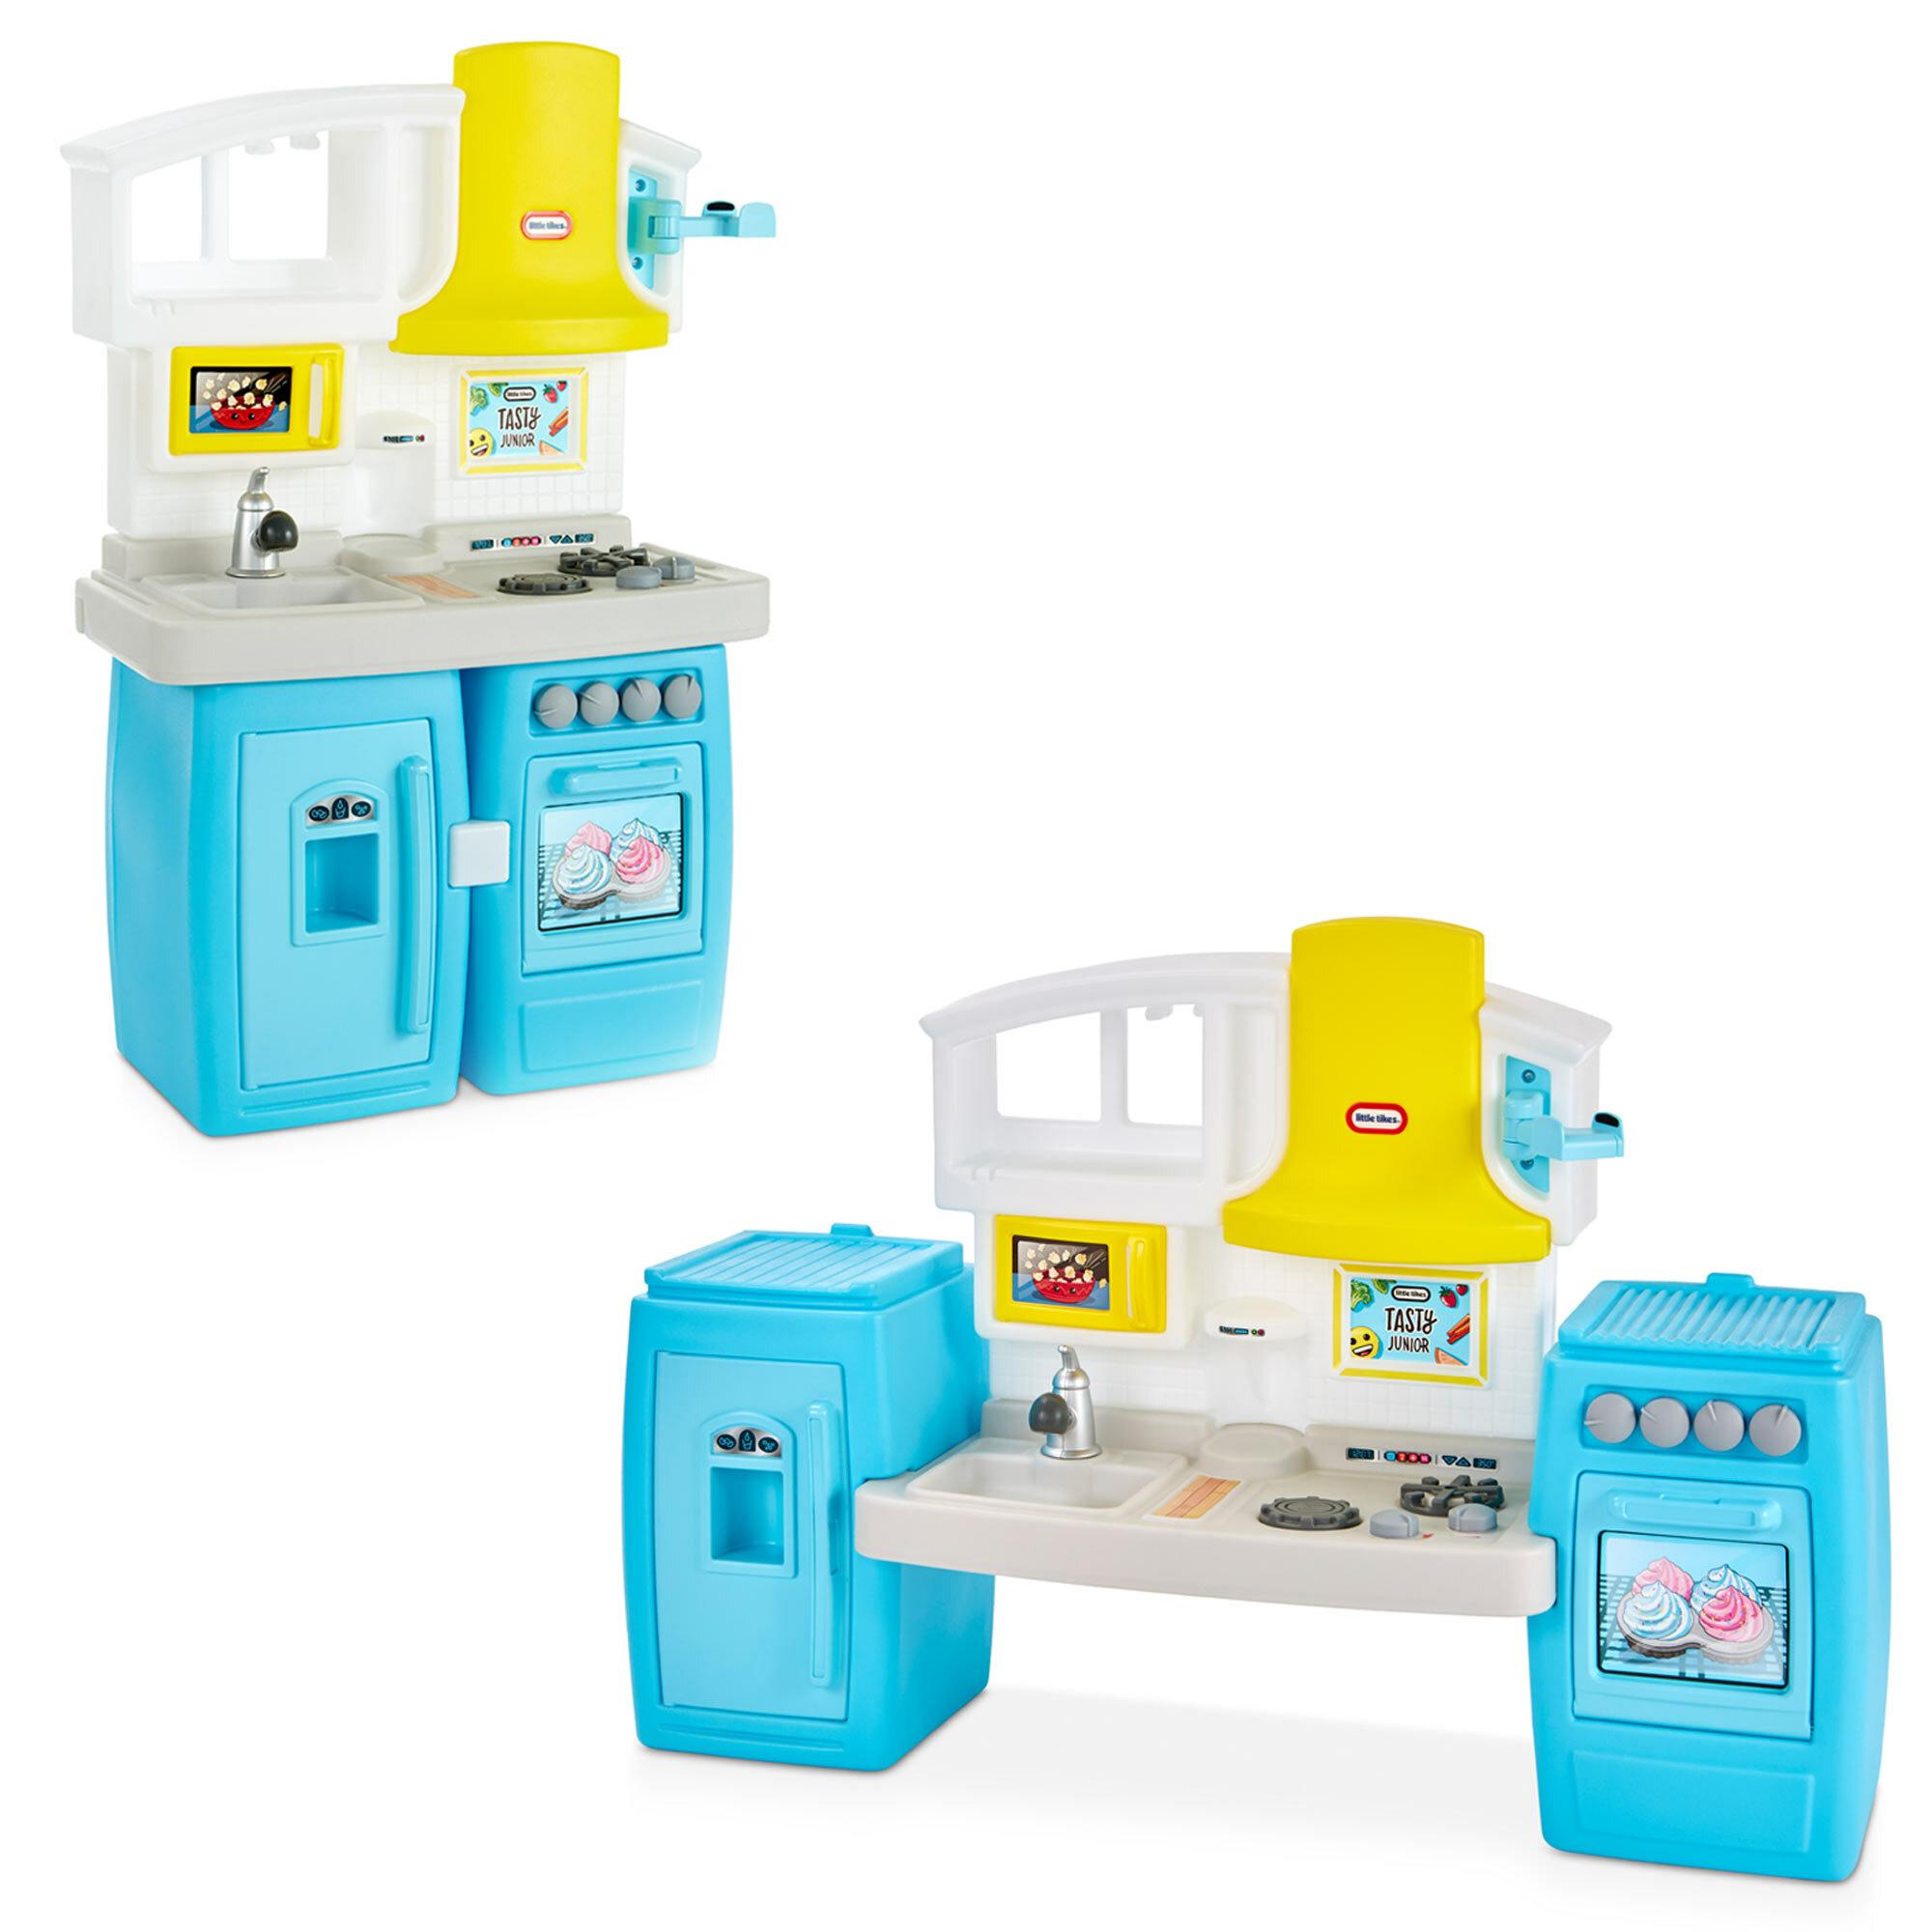 Little Tikes Tasty Jr Bake N Share Kitchen Set Reviews Wayfair